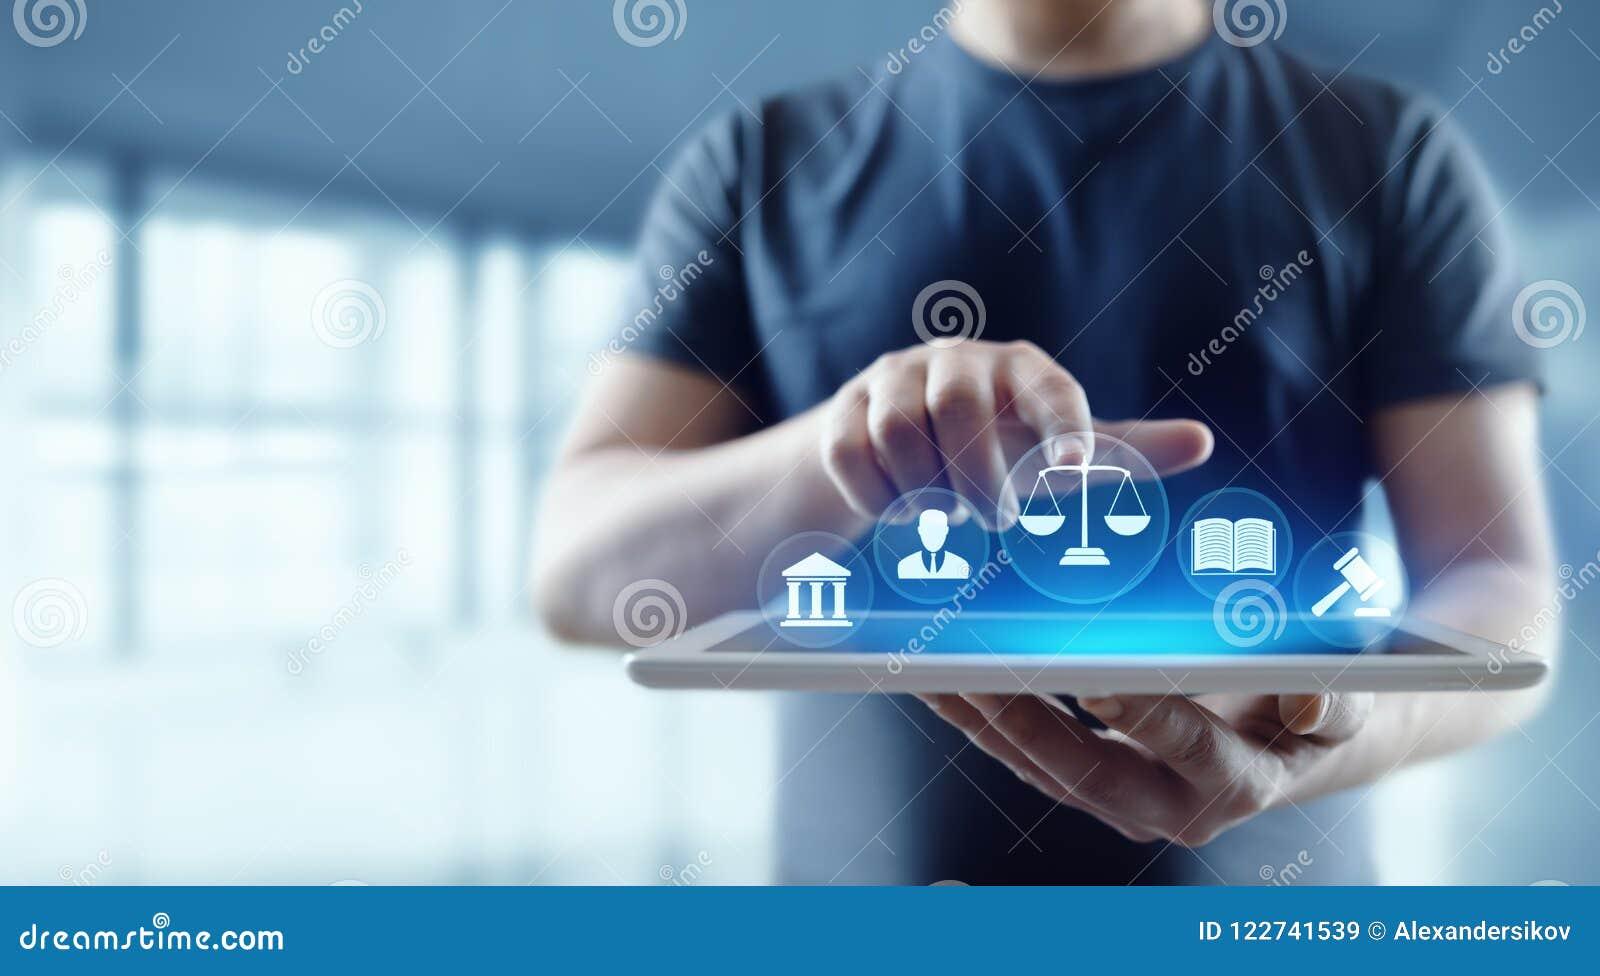 Conceito da tecnologia de Legal Business Internet do advogado da lei laboral